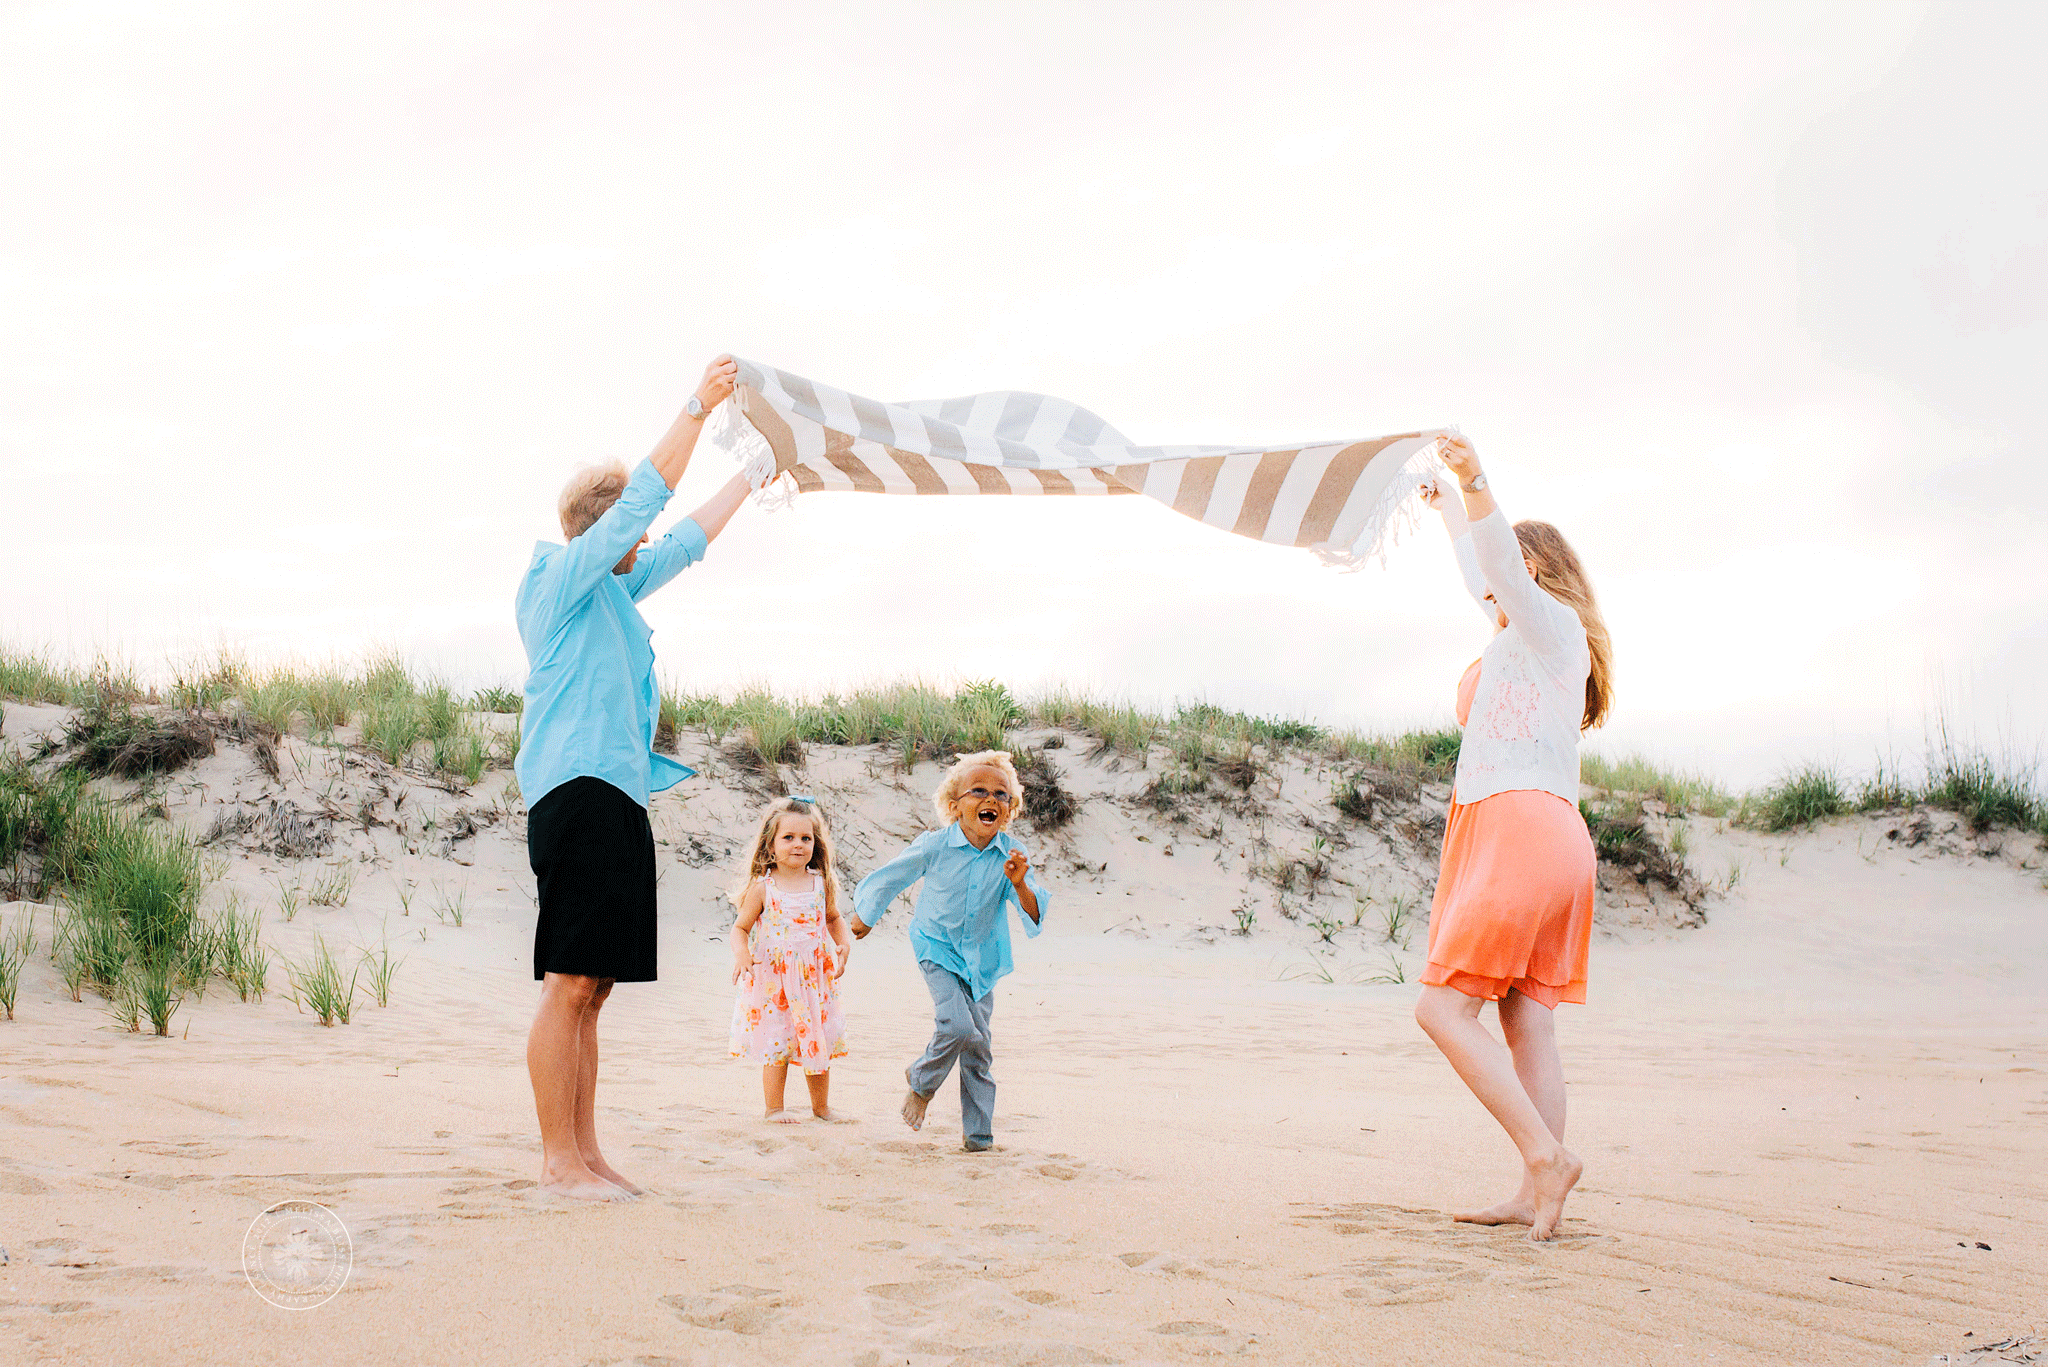 virginia-beach-family-photographers-lifestyle-beach-family-session-melissa-bliss-photography-sandbridge-chesapeake-norfolk-va-beach.png